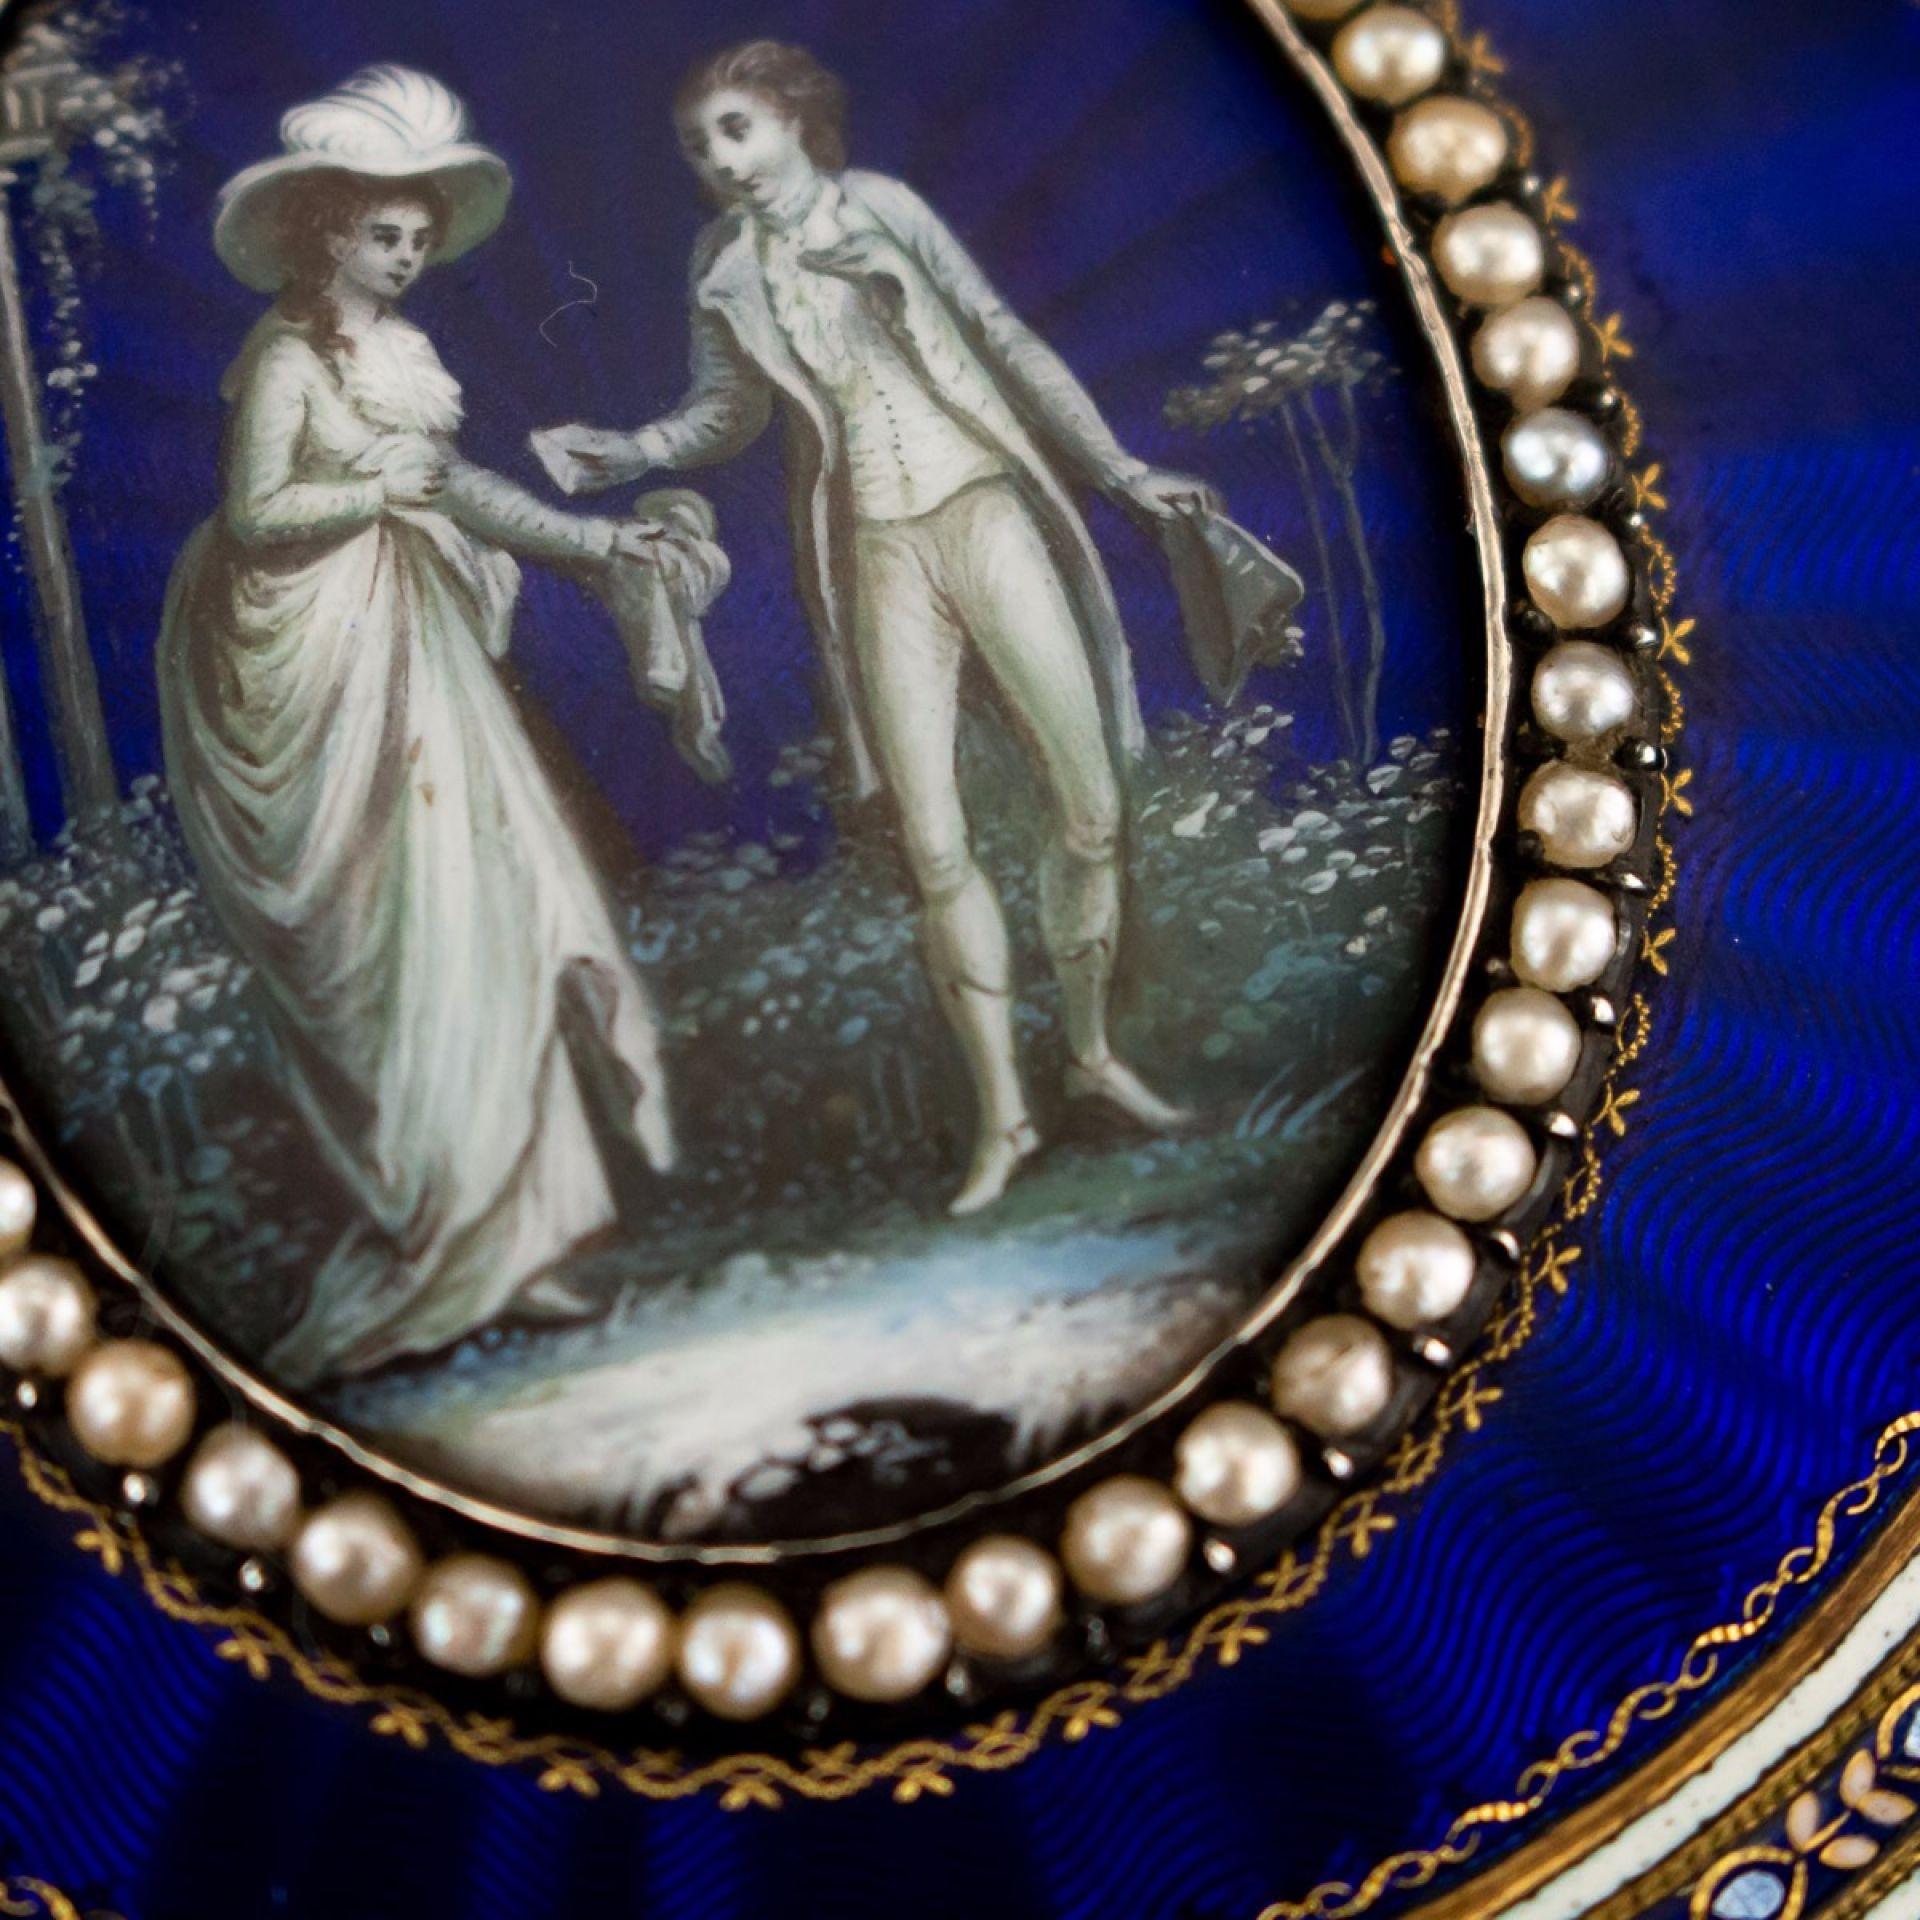 ANTIQUE 19thC FRENCH 18k GOLD & HAND PAINTED ENAMEL BONBONNIERE BOX c.1800